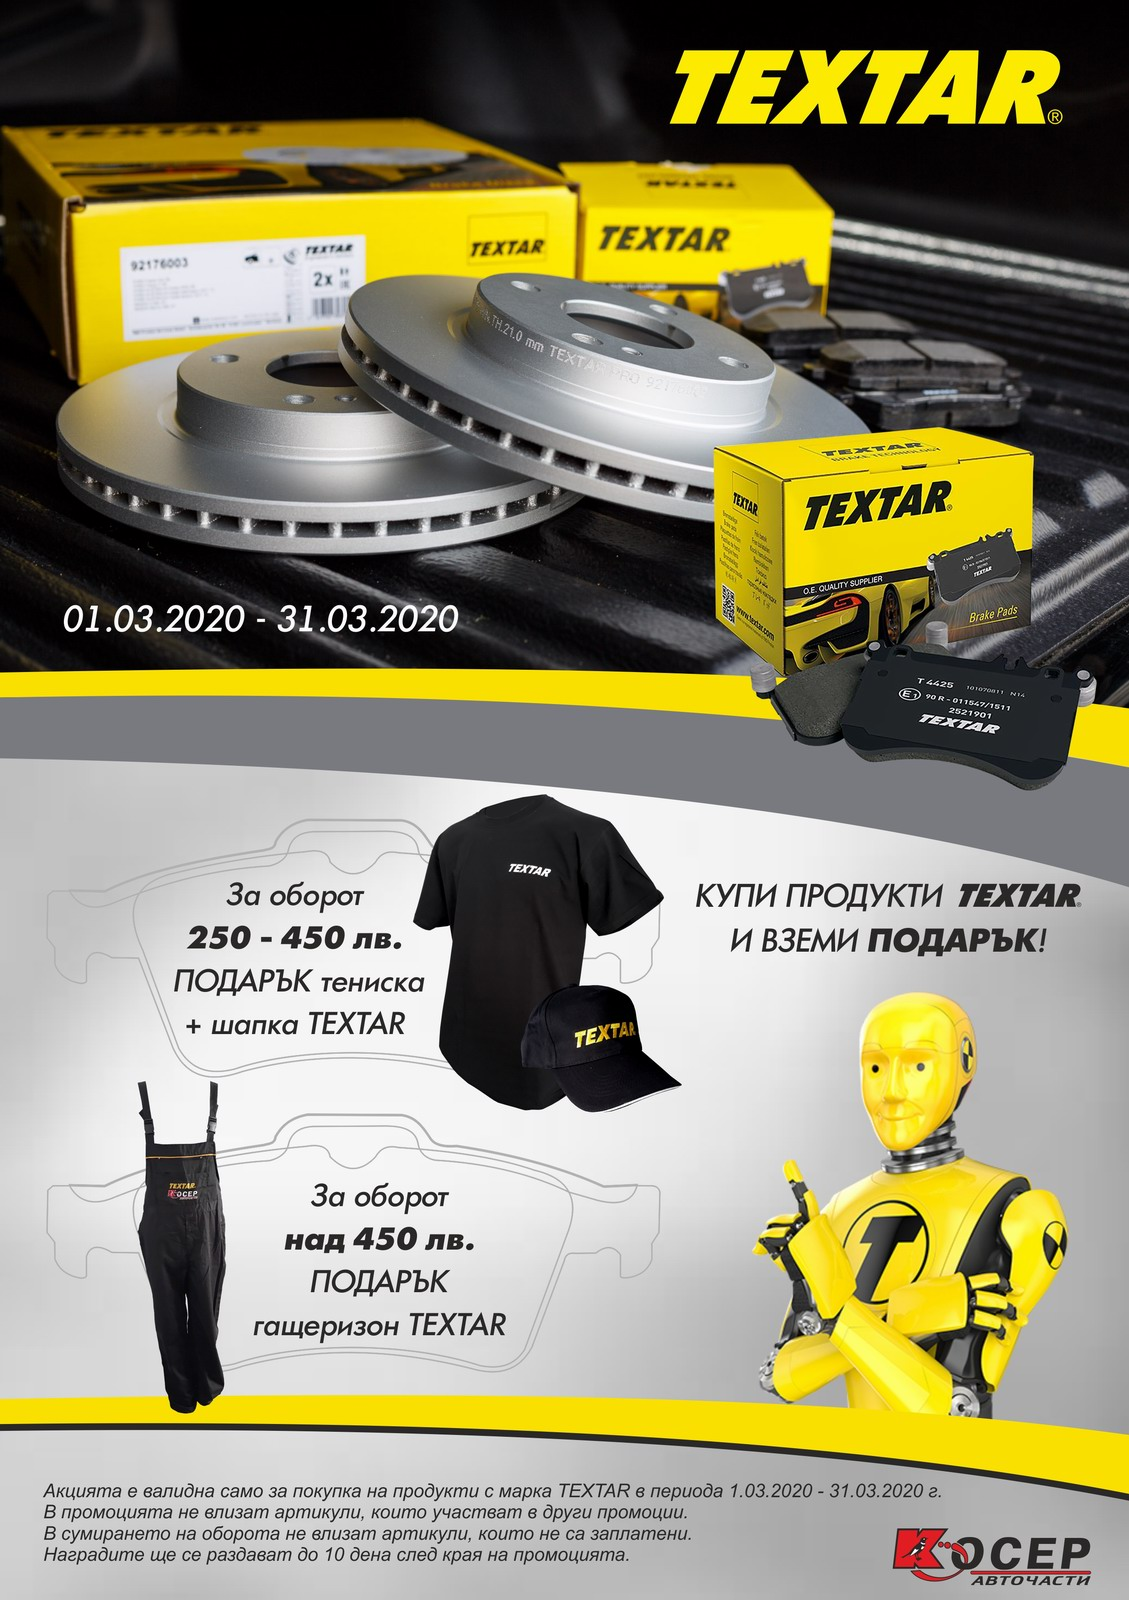 Промоция TEXTAR, 01.03.2020 - 31.03.2020